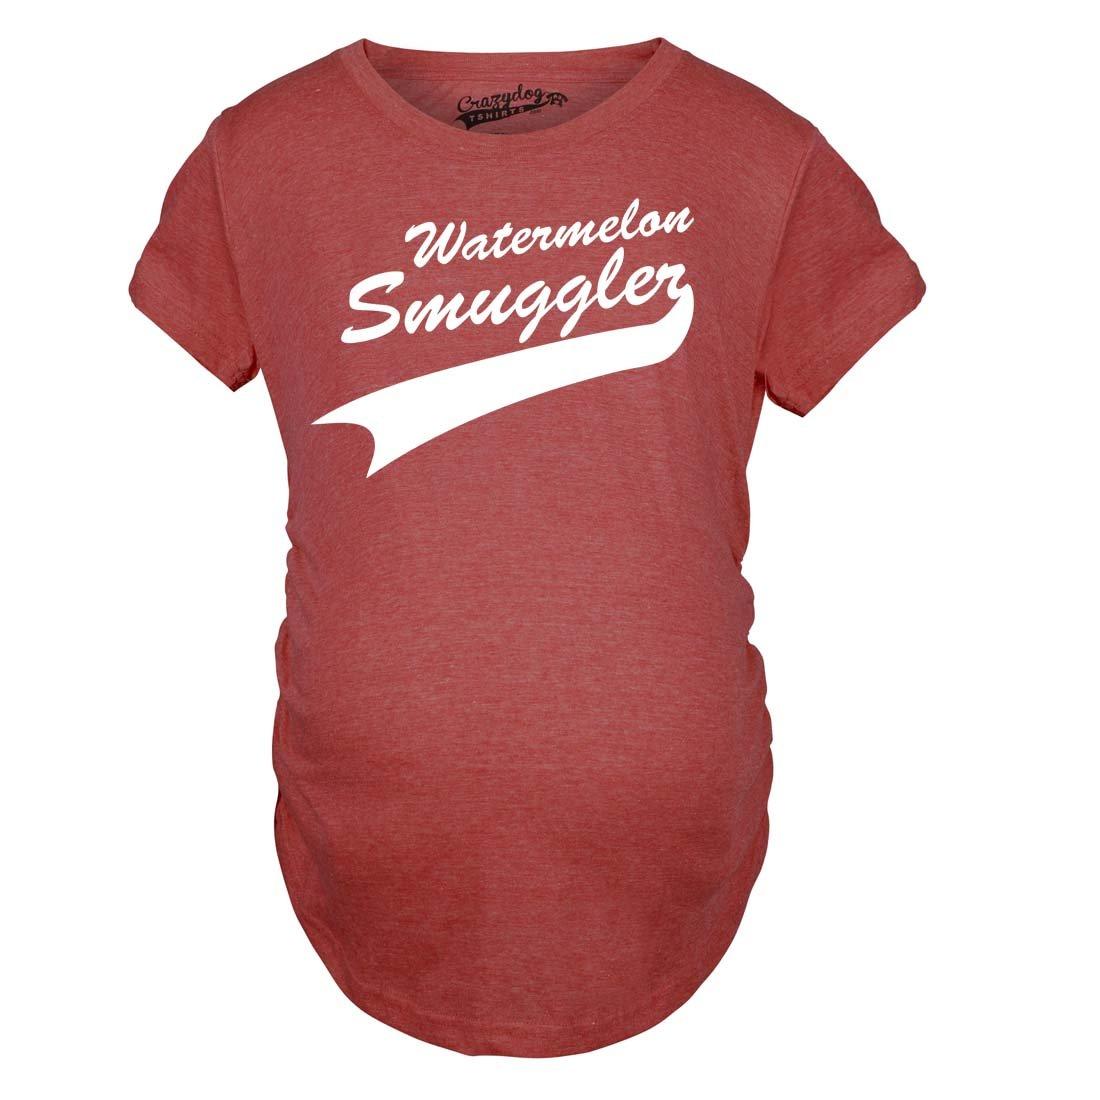 Maternity Watermelon Smuggler Shirt Funny Pregnancy T shirts Announcement Ideas Crazy Dog Tshirts 99watermelonsmuggler